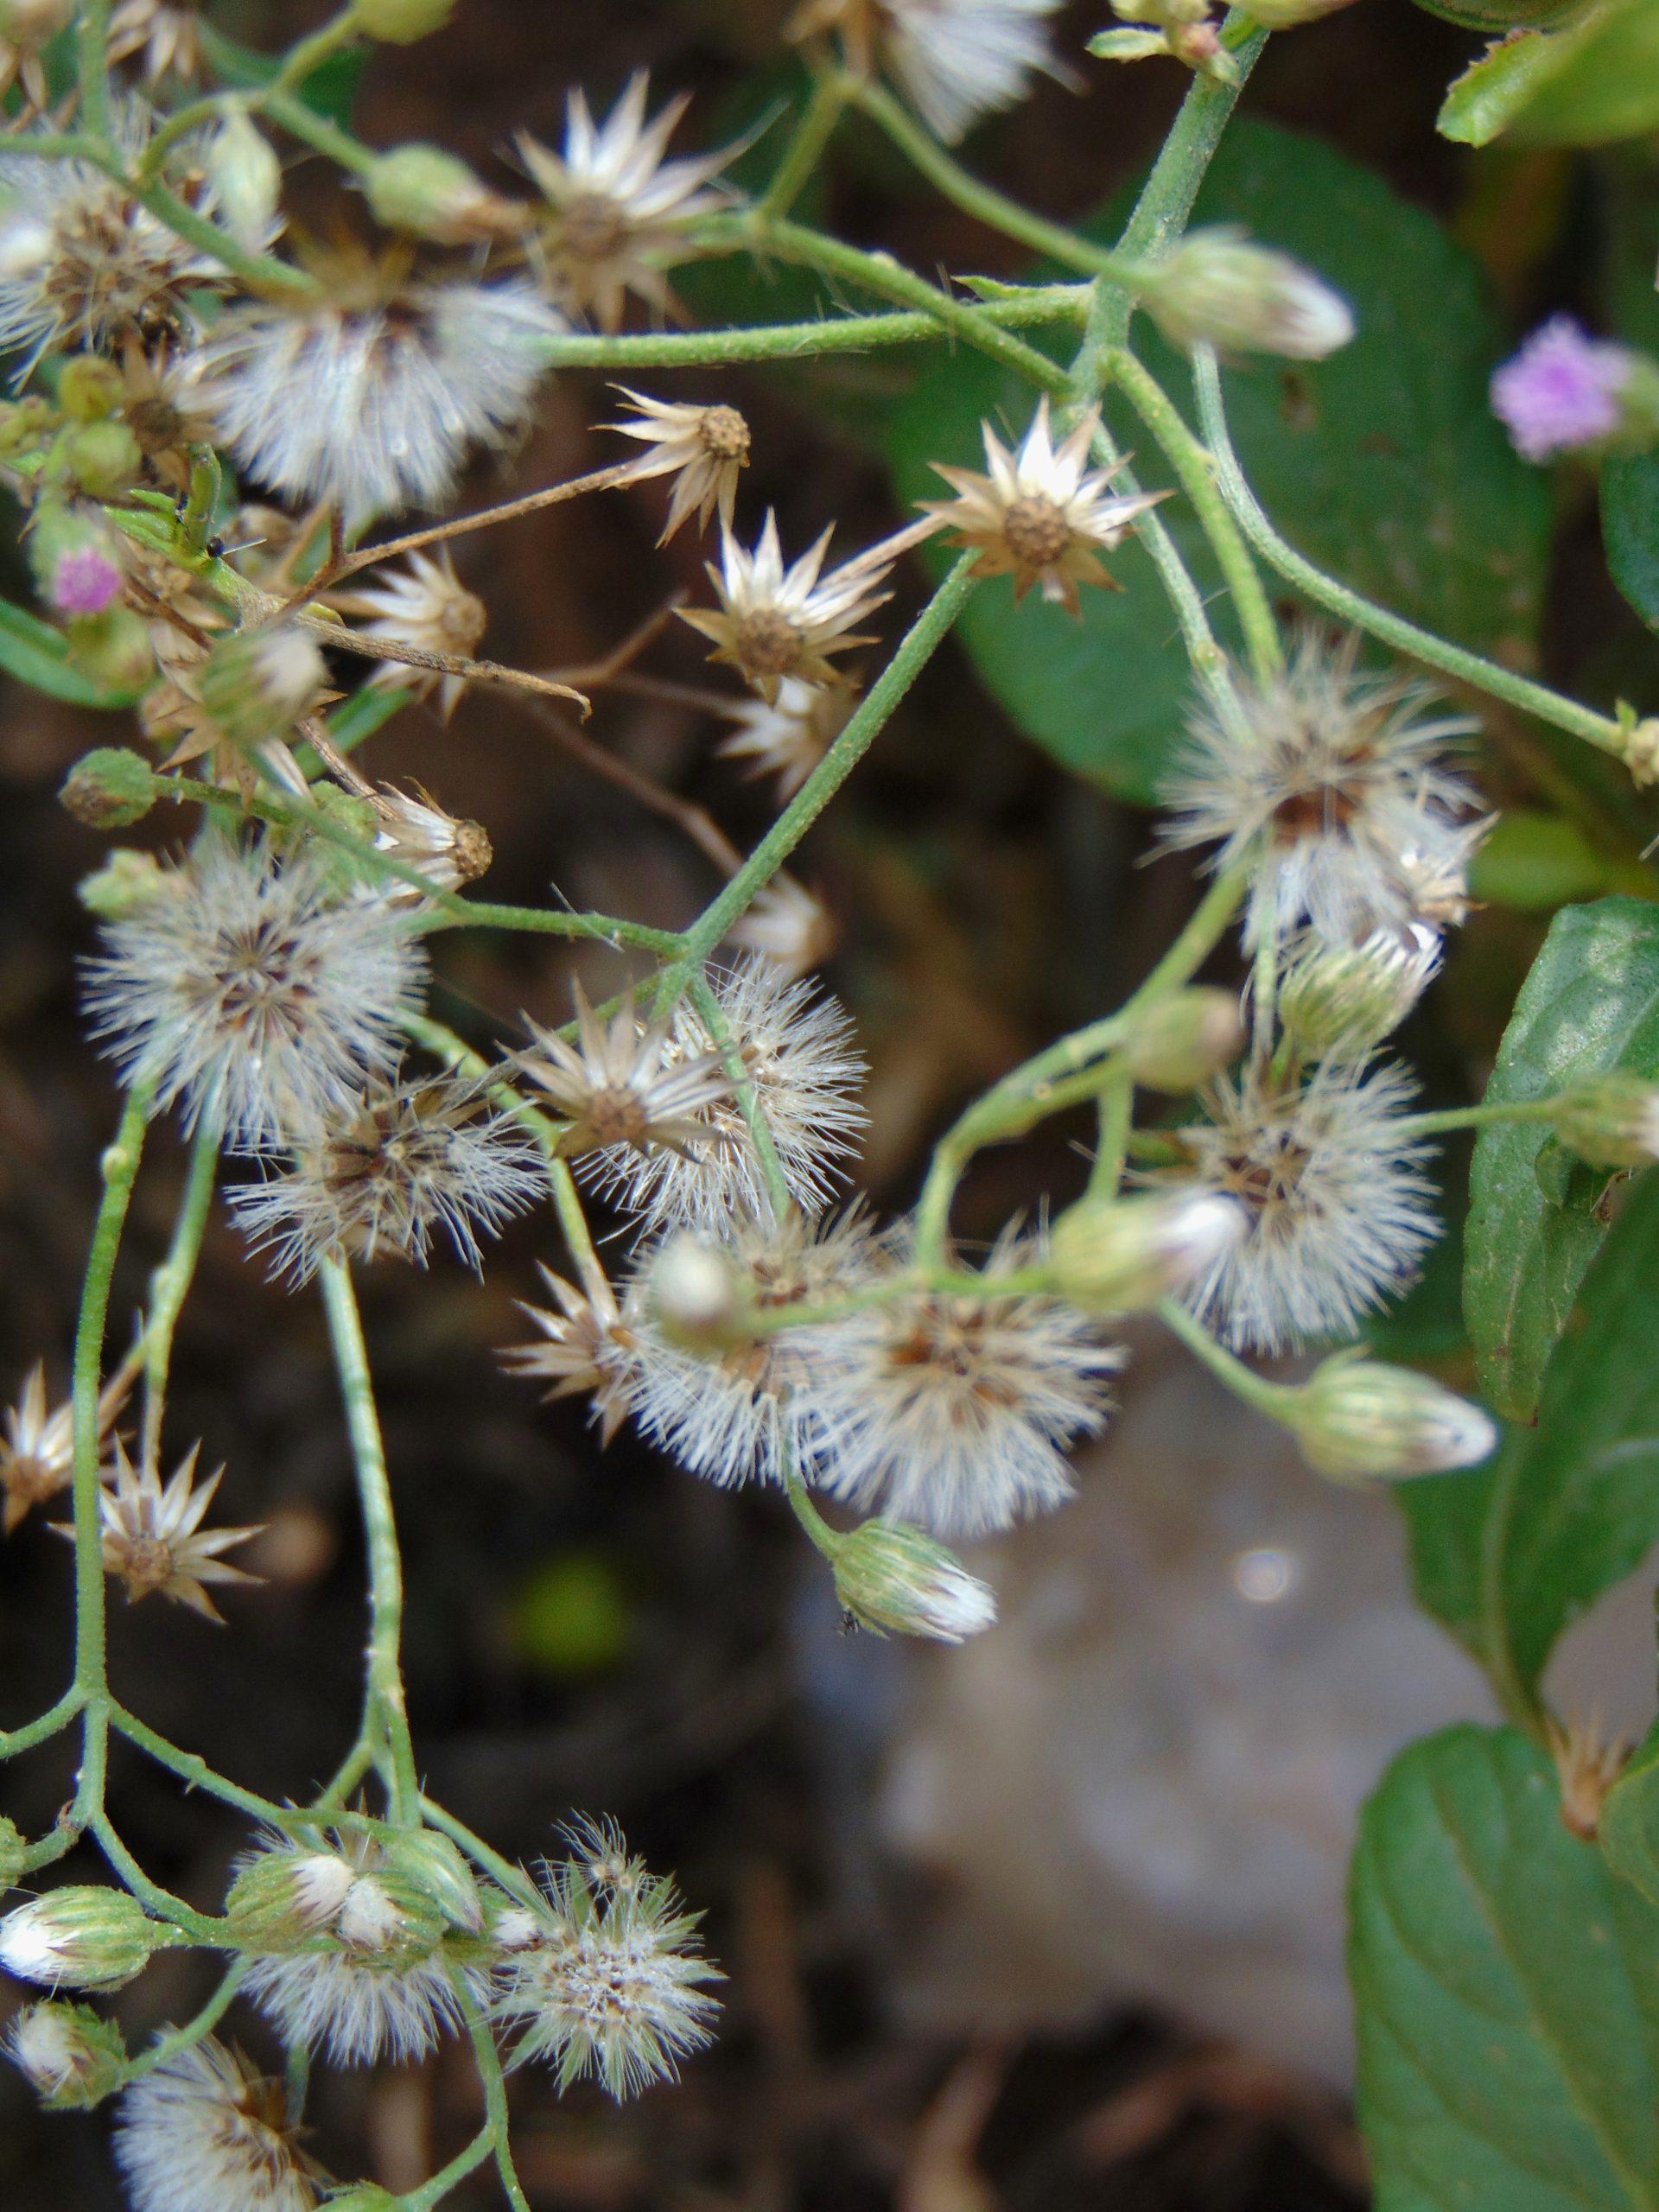 Wildflowers on plant